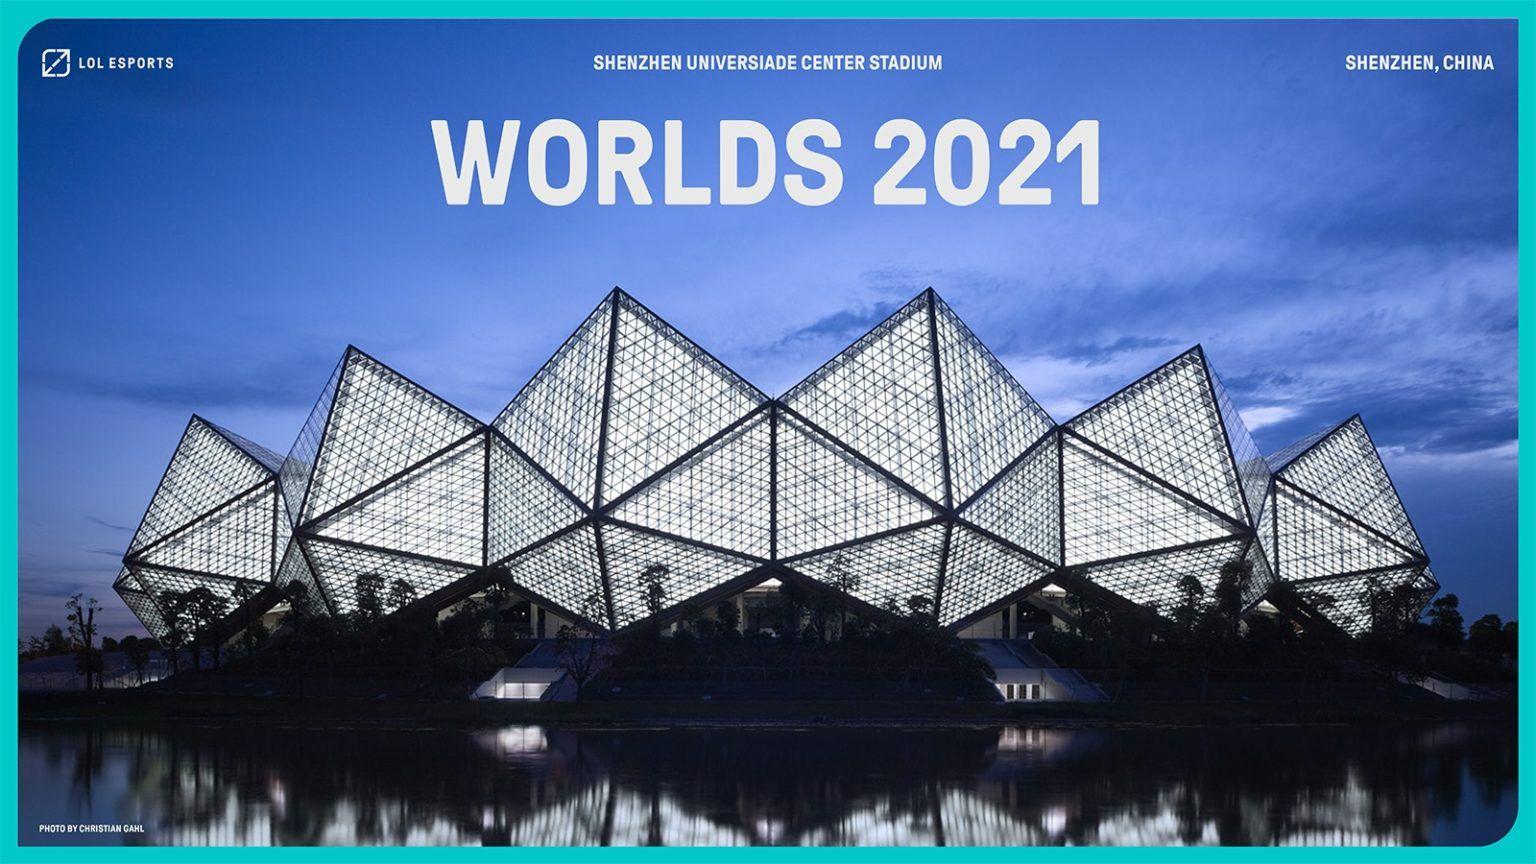 Stadium Universiade Sports Centre untuk gelaran Worlds 2021.